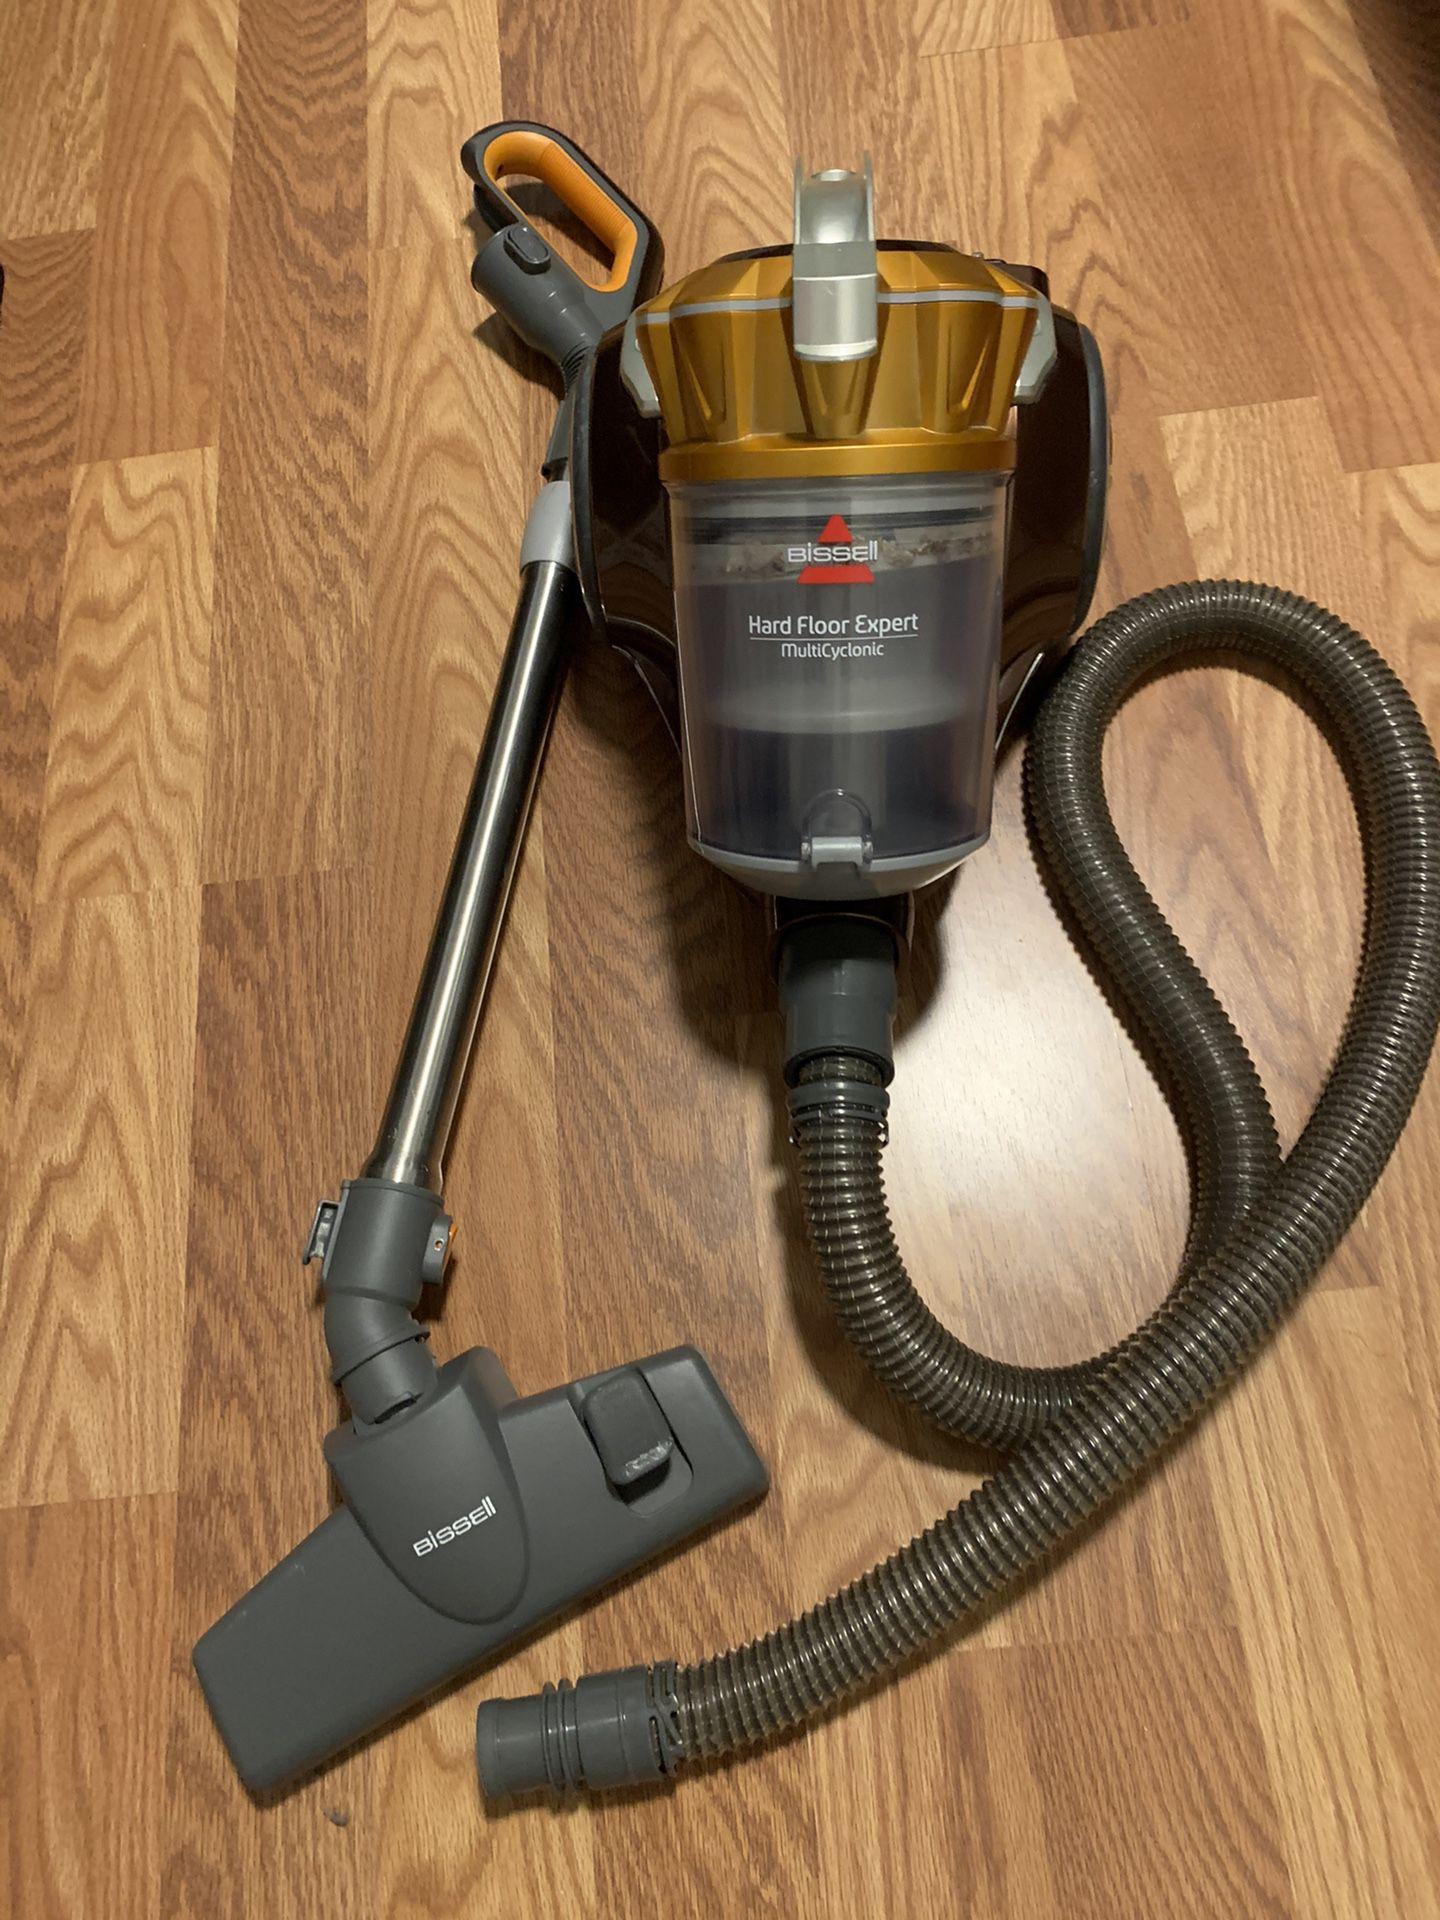 Bissell Hard Floor Expert Vacuum